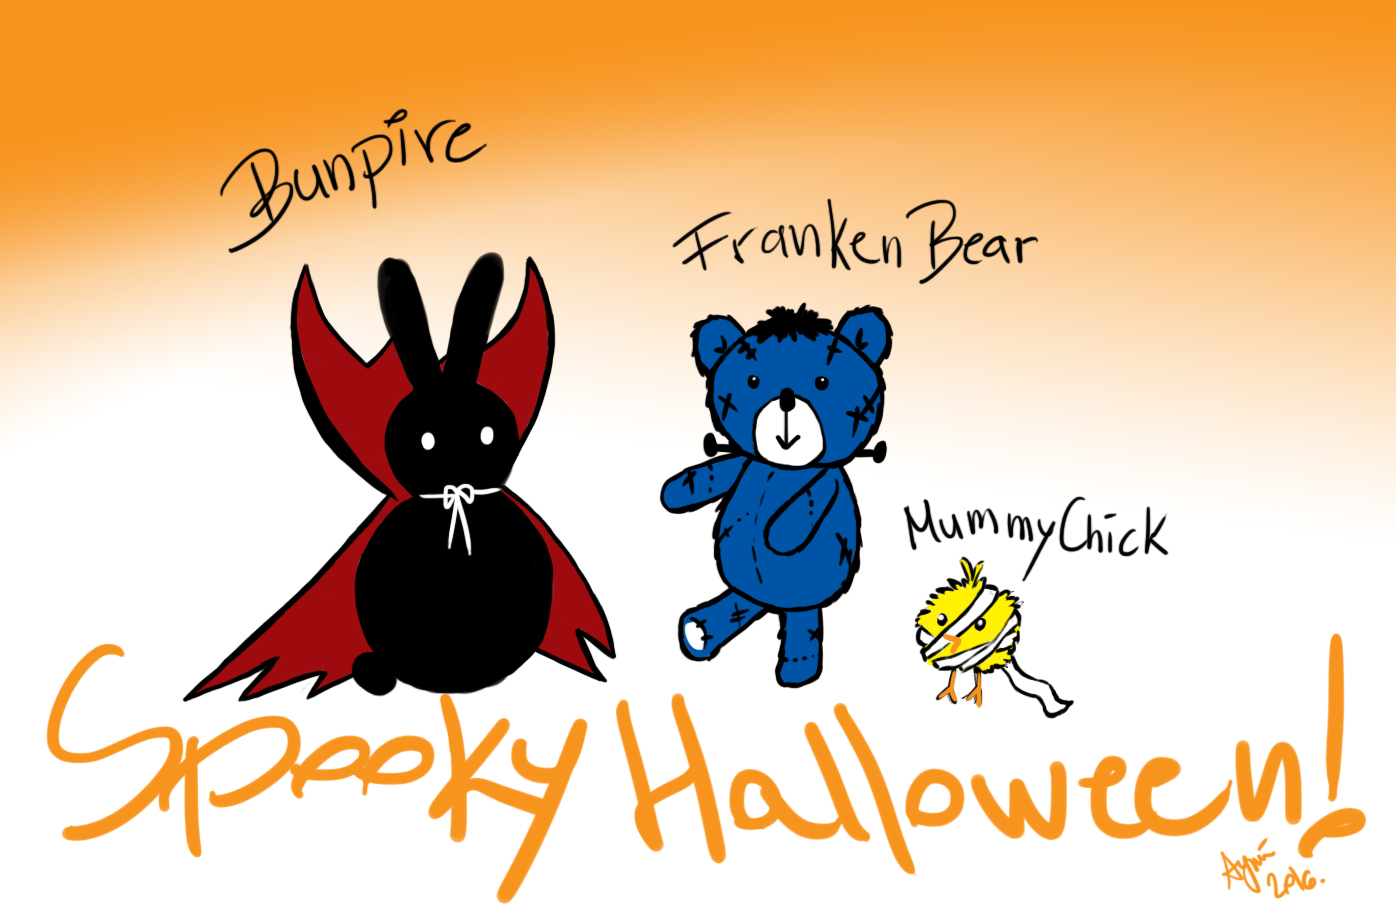 my little fellowship wish you spooky halloween!